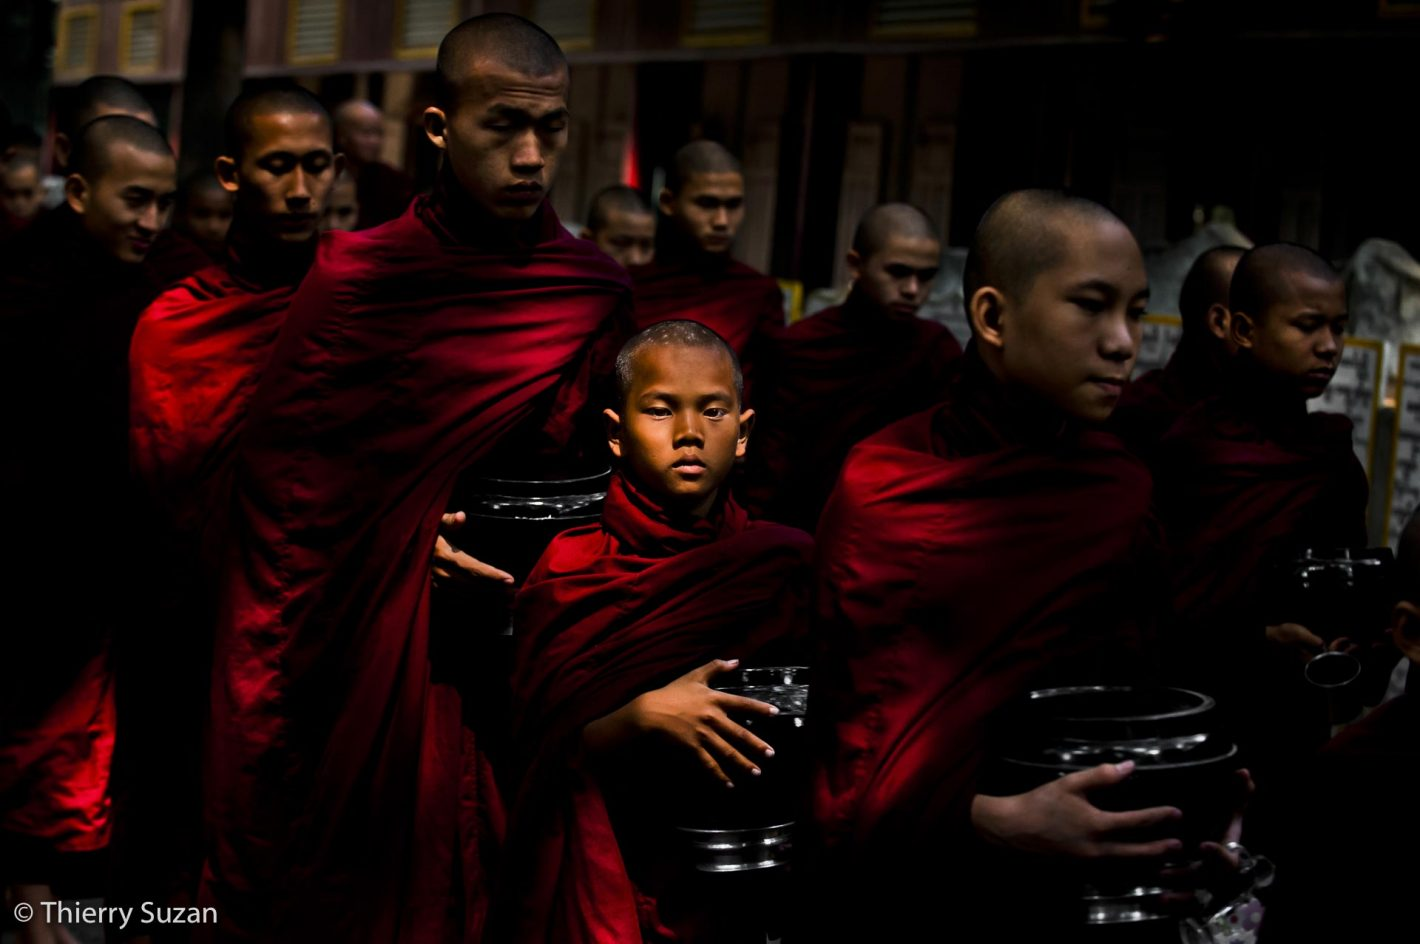 Moines bouddhistes, monastère Mahandayon, Amarapura, Myanmar.